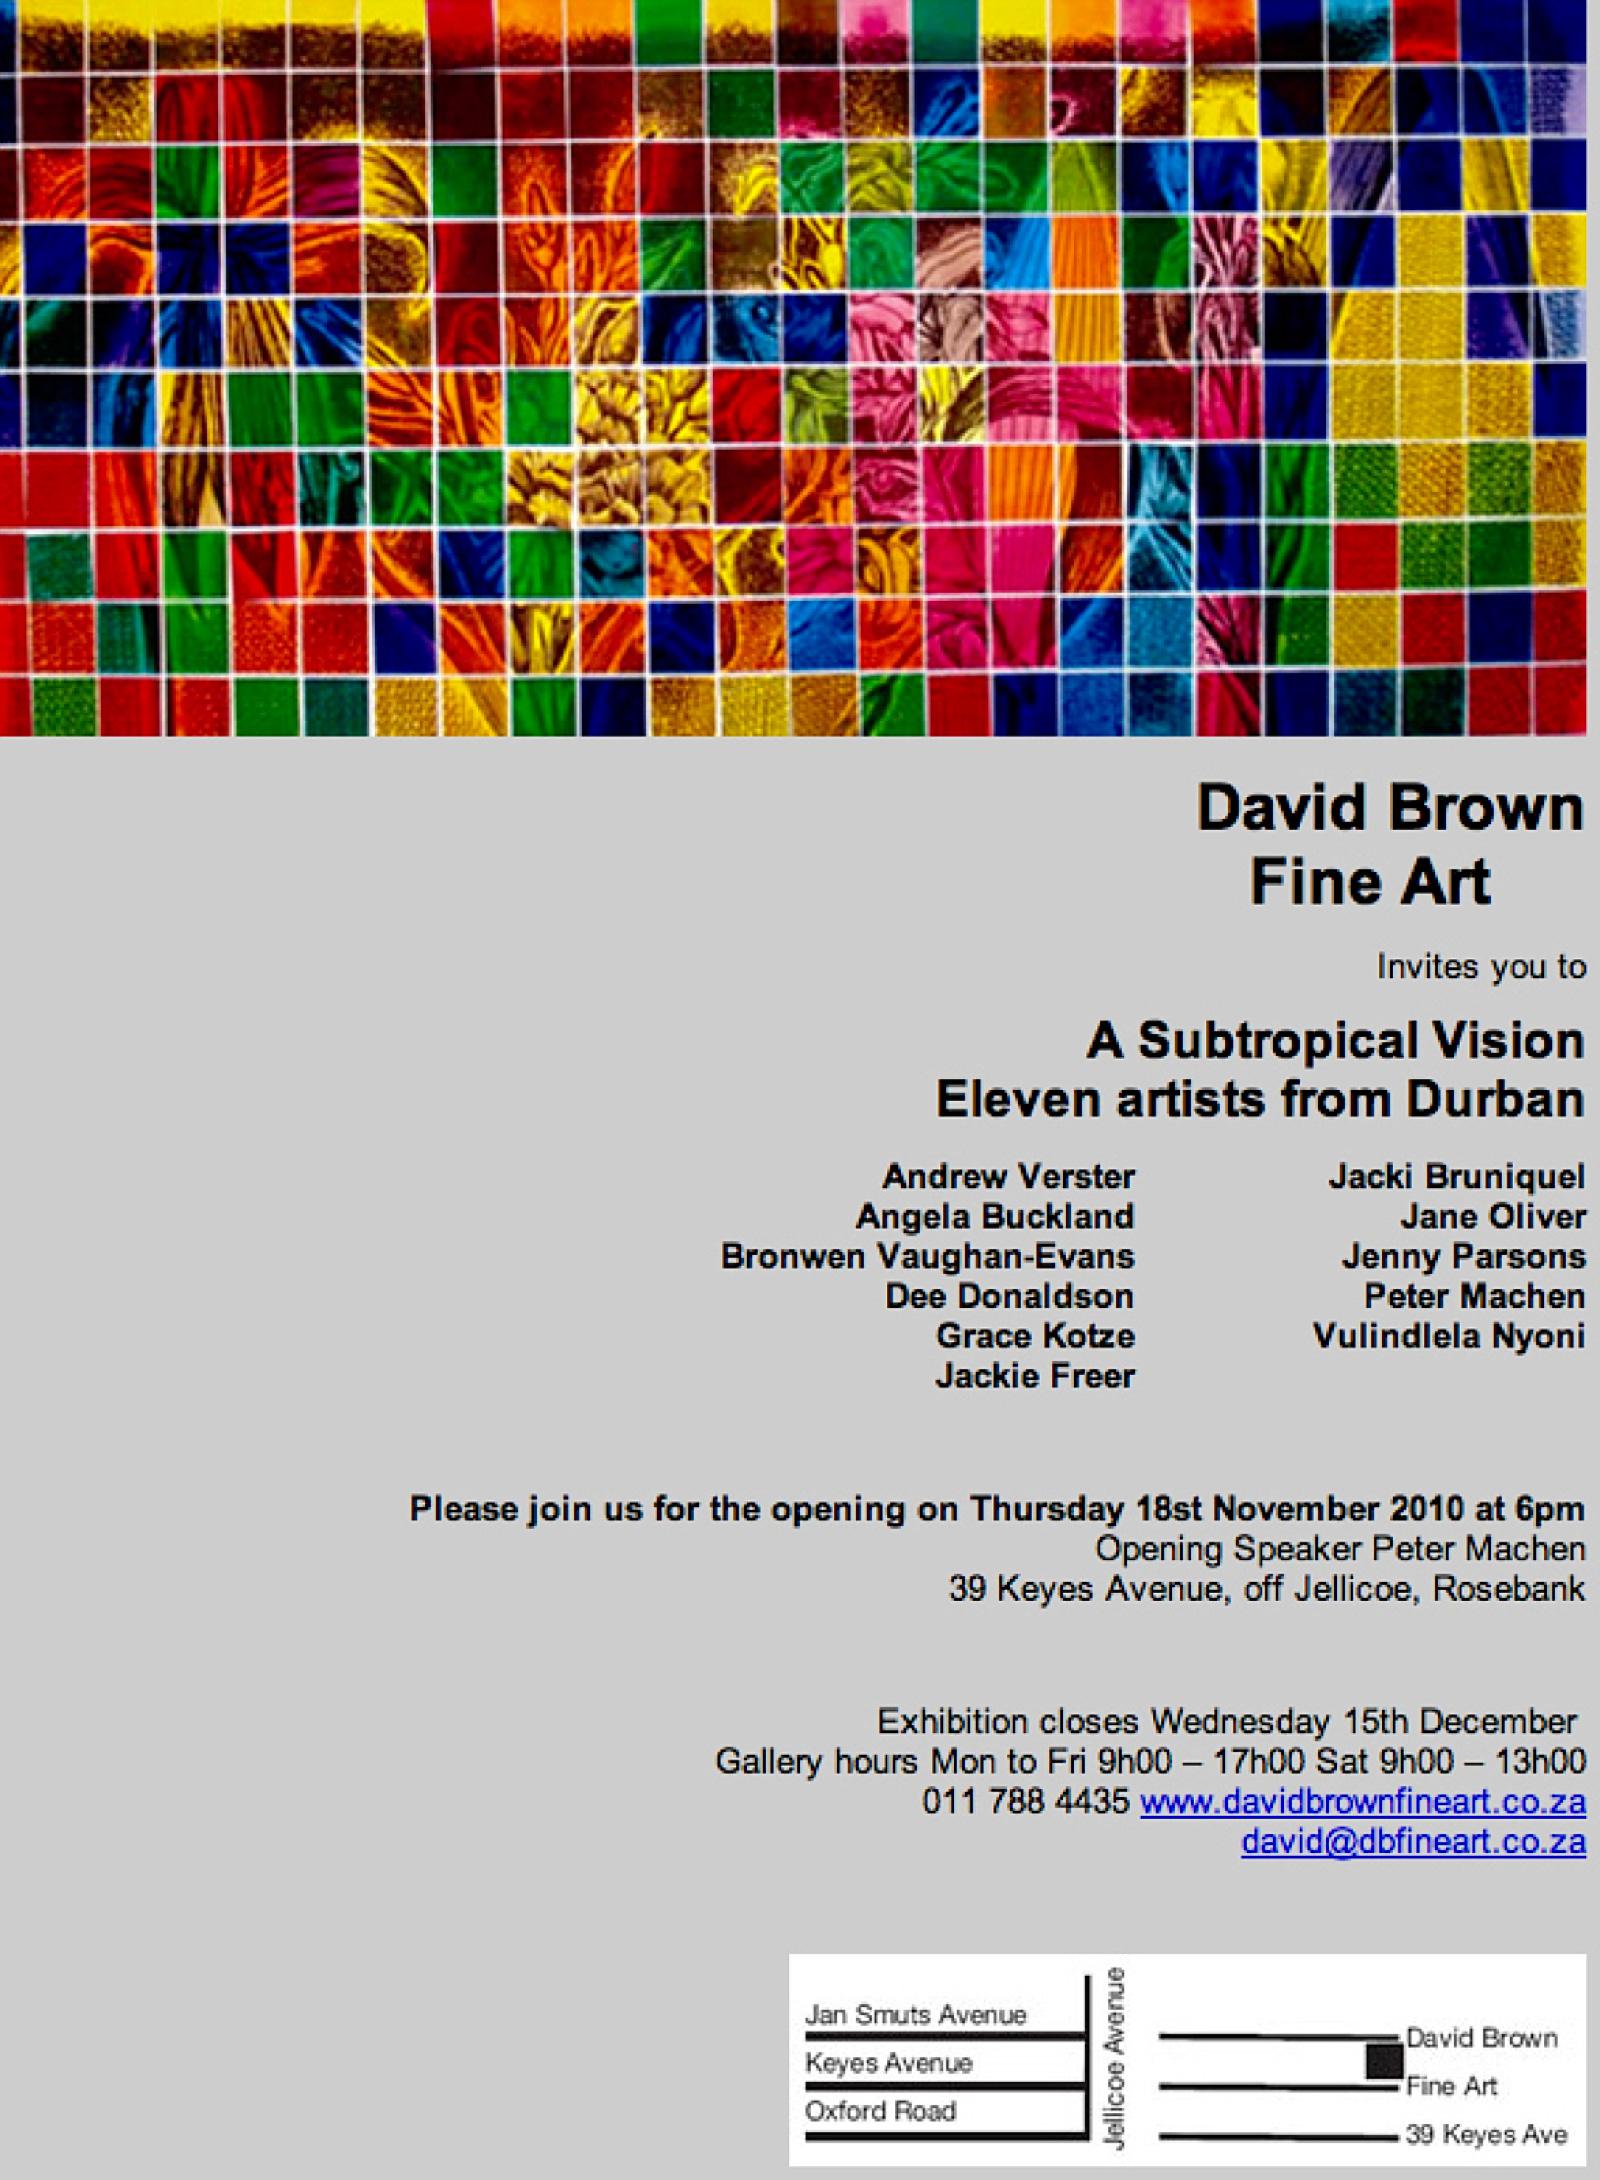 David-Brown-Exhibition-KZN-Photographer-Jacki-Bruniquel-1